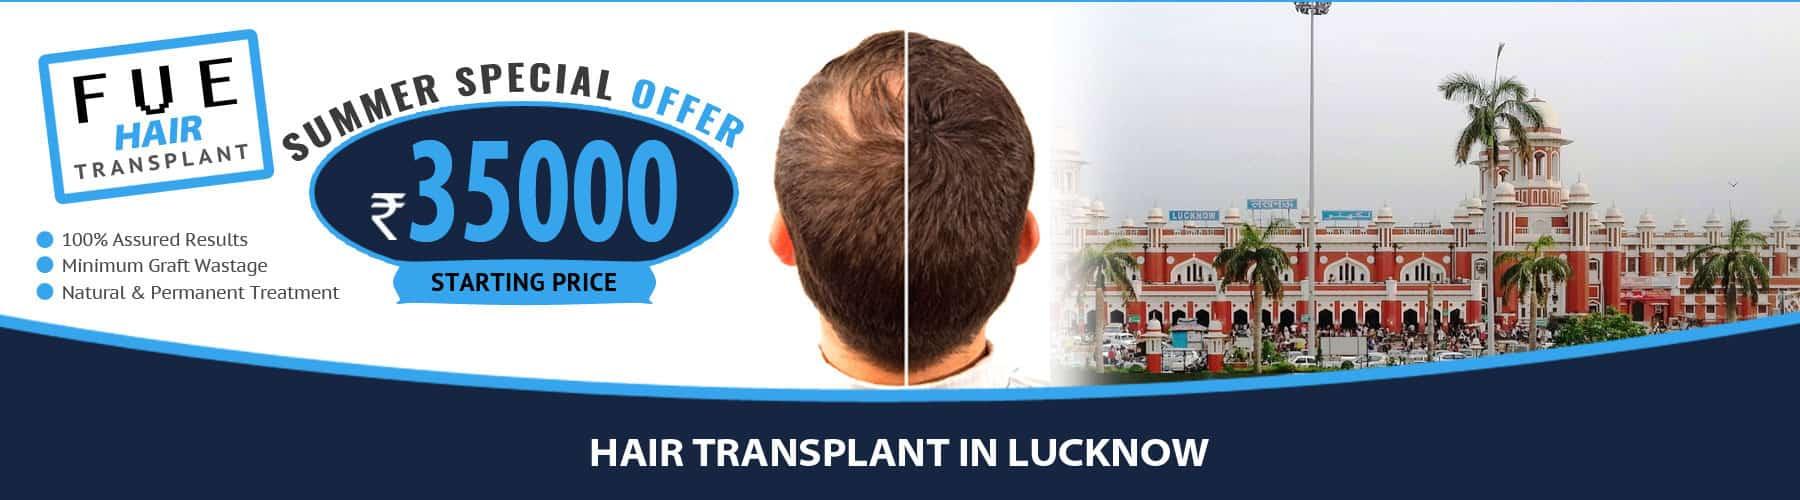 Hair Transplant Lucknow